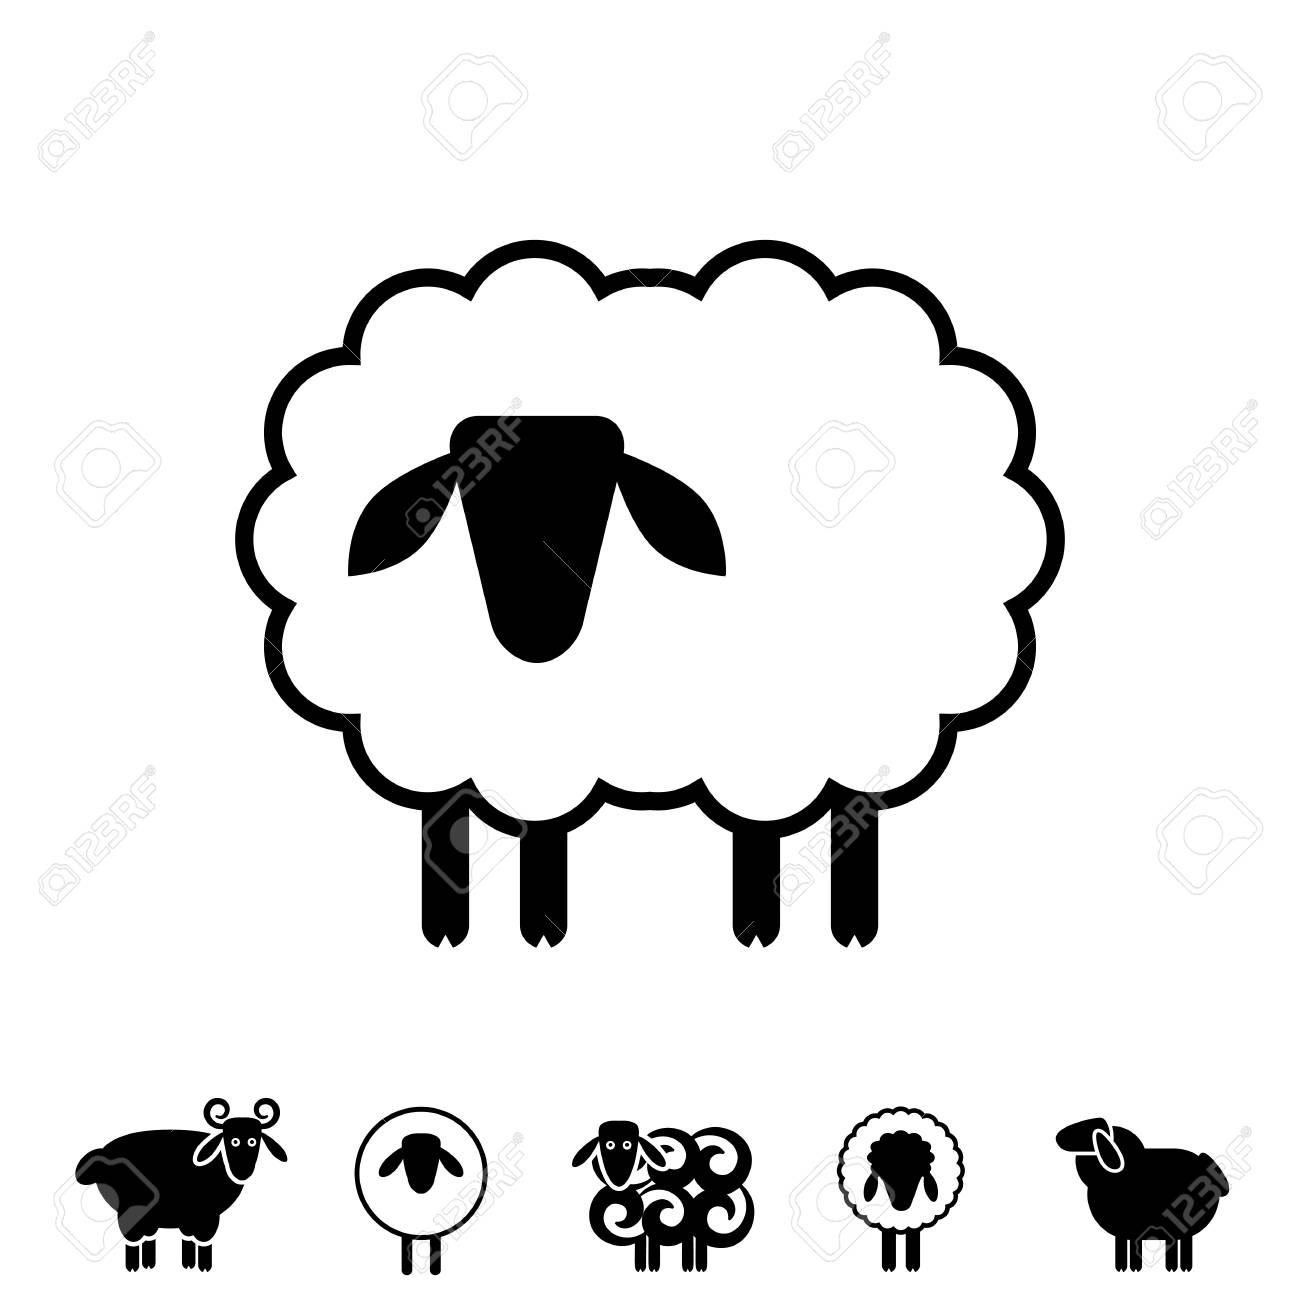 Sheep or Ram Icon, Logo, Template, Pictograph